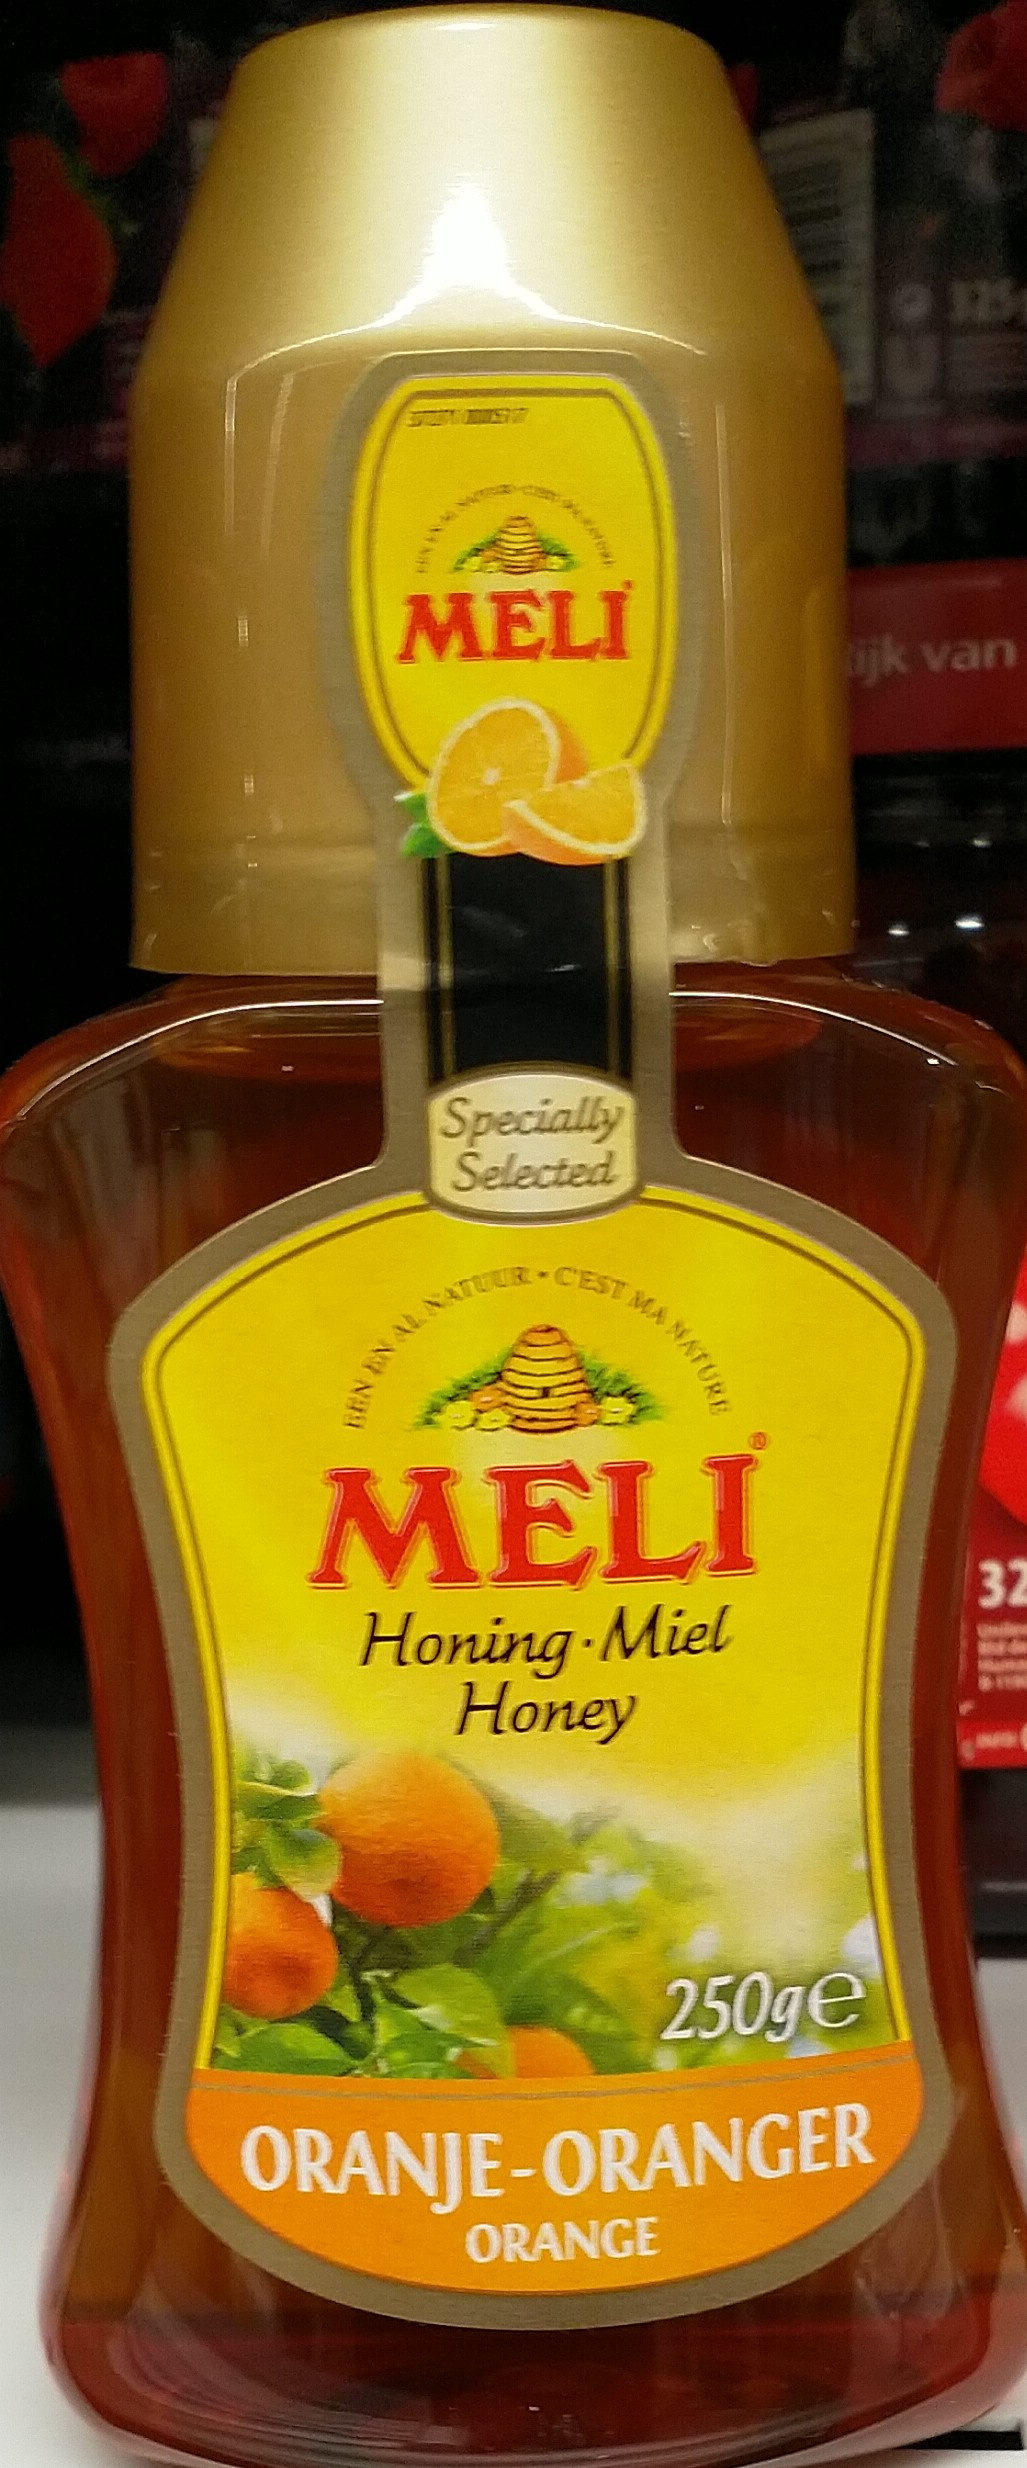 Honing honey - Product - en